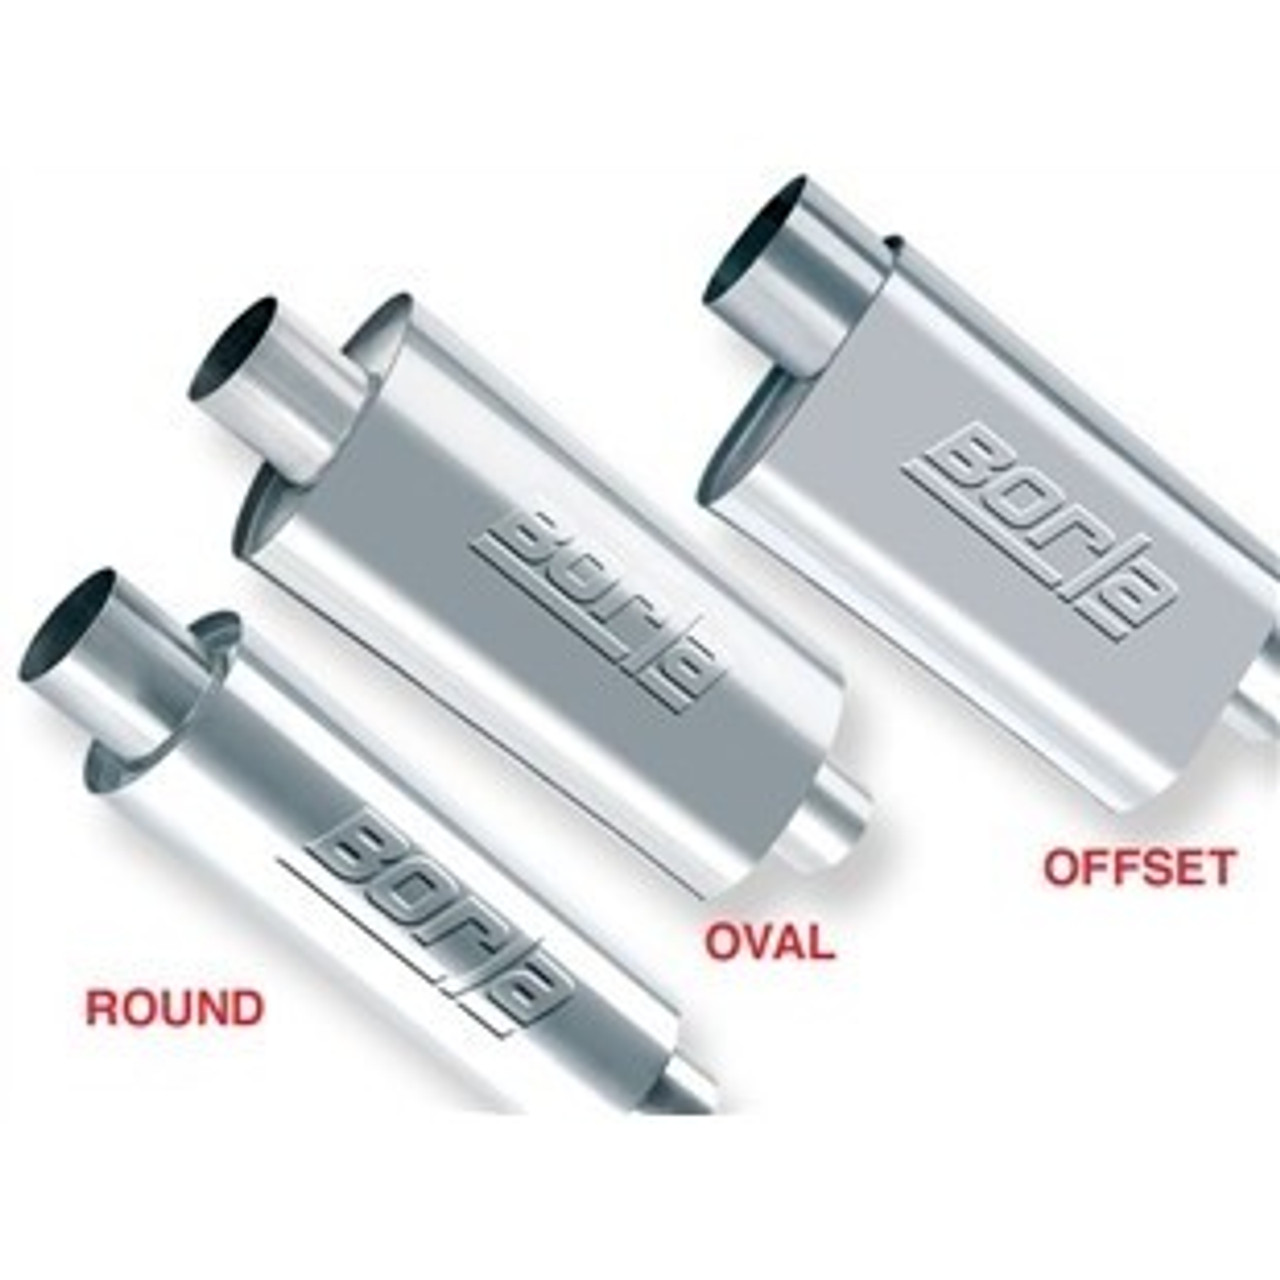 borla xr 1 racing sportsman 2 1 2 inch outlet 2 1 2 inch inlet 12in case oval muffler pn 40941